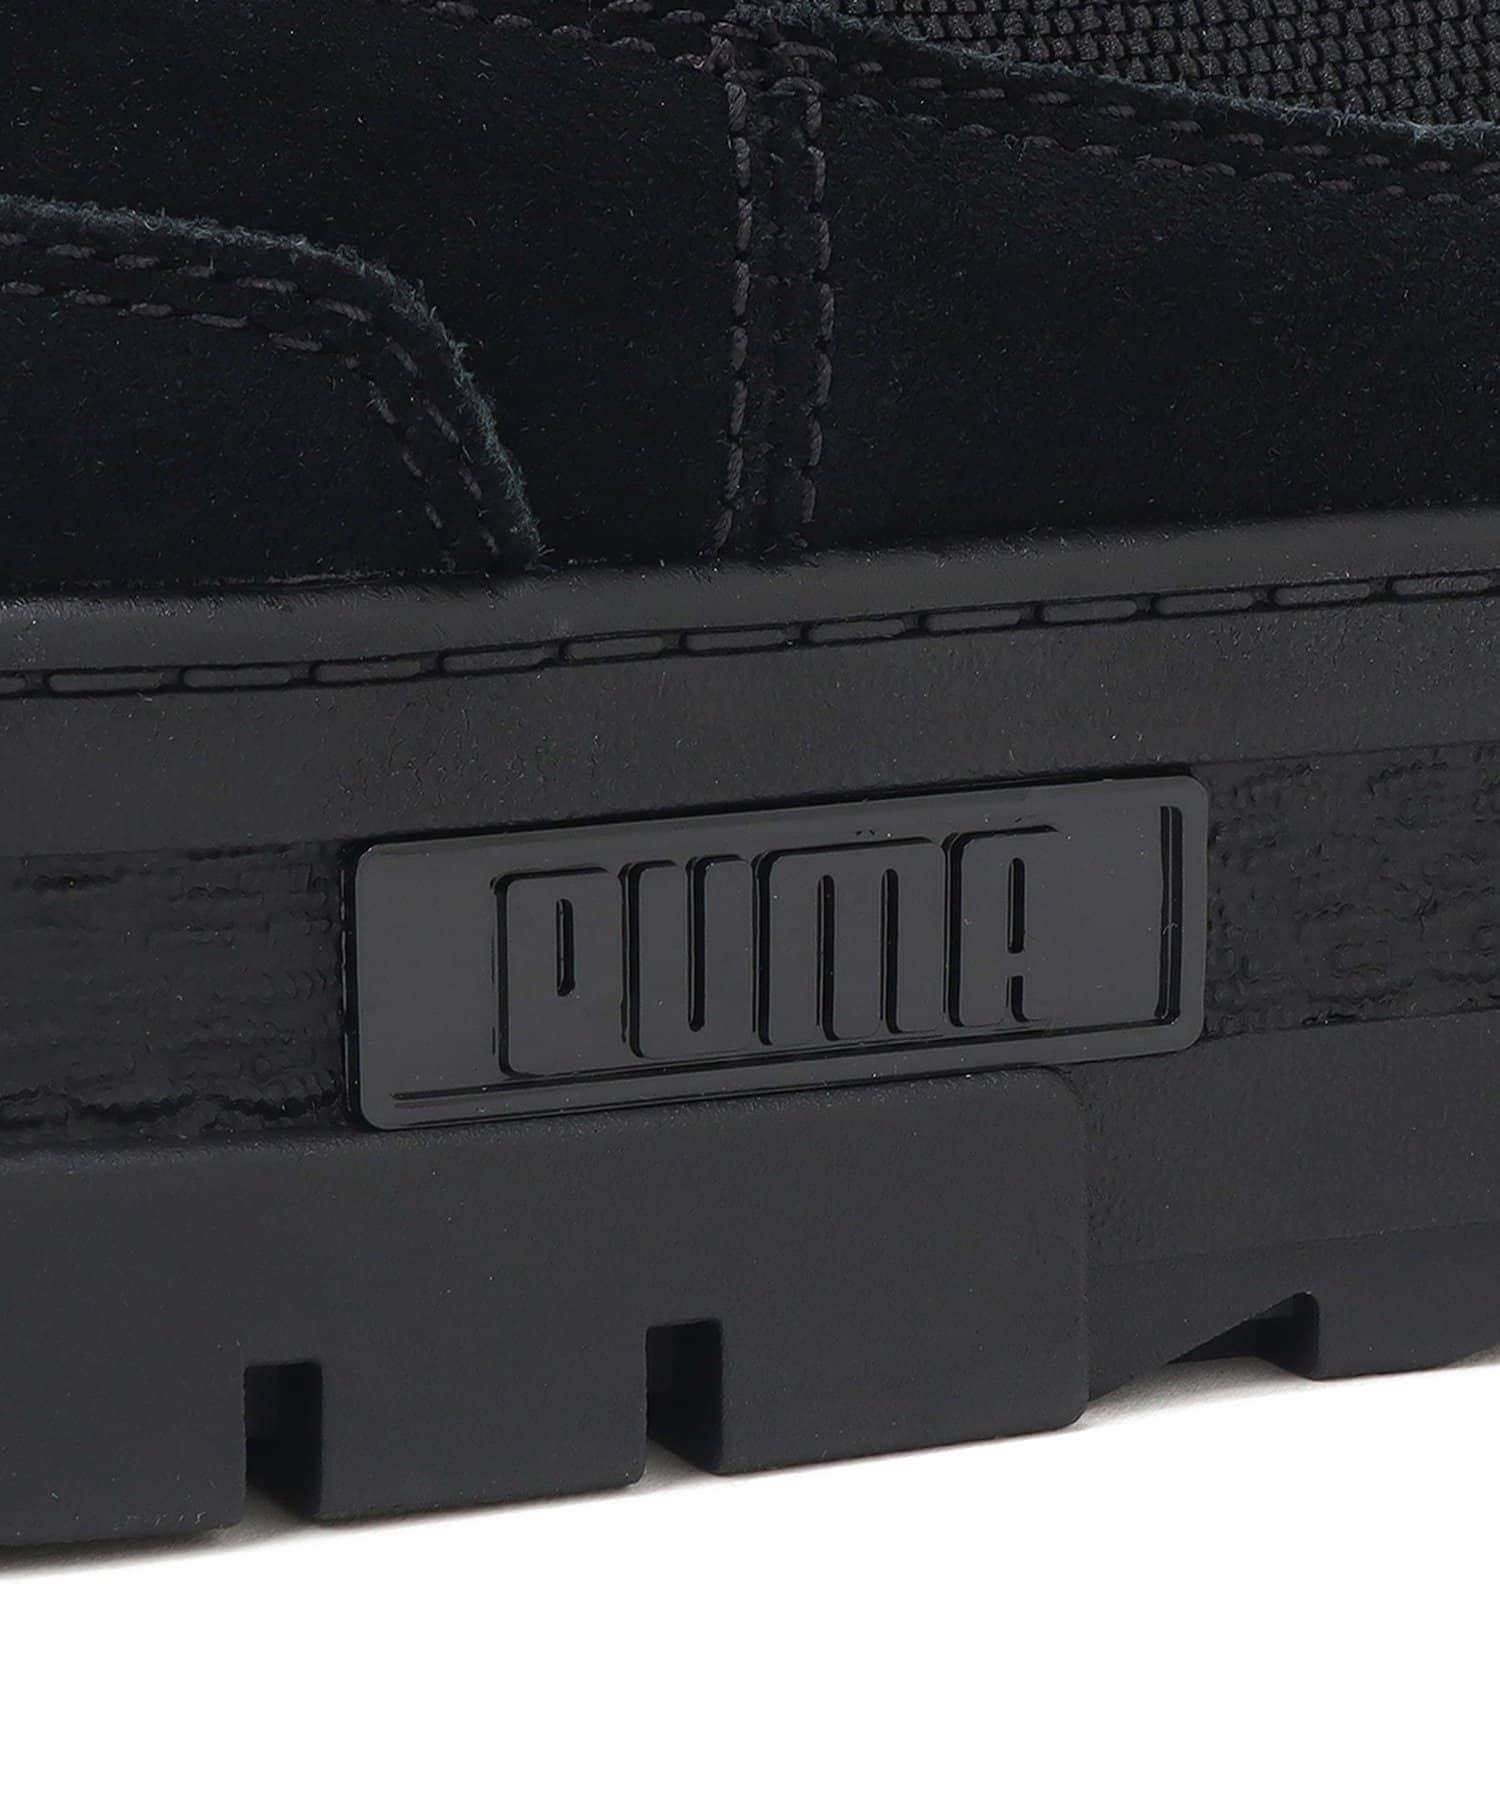 Lui's(ルイス) 【PUMA/プーマ】 メイズ チェルシー スウェード ウィメンズ ブーツ